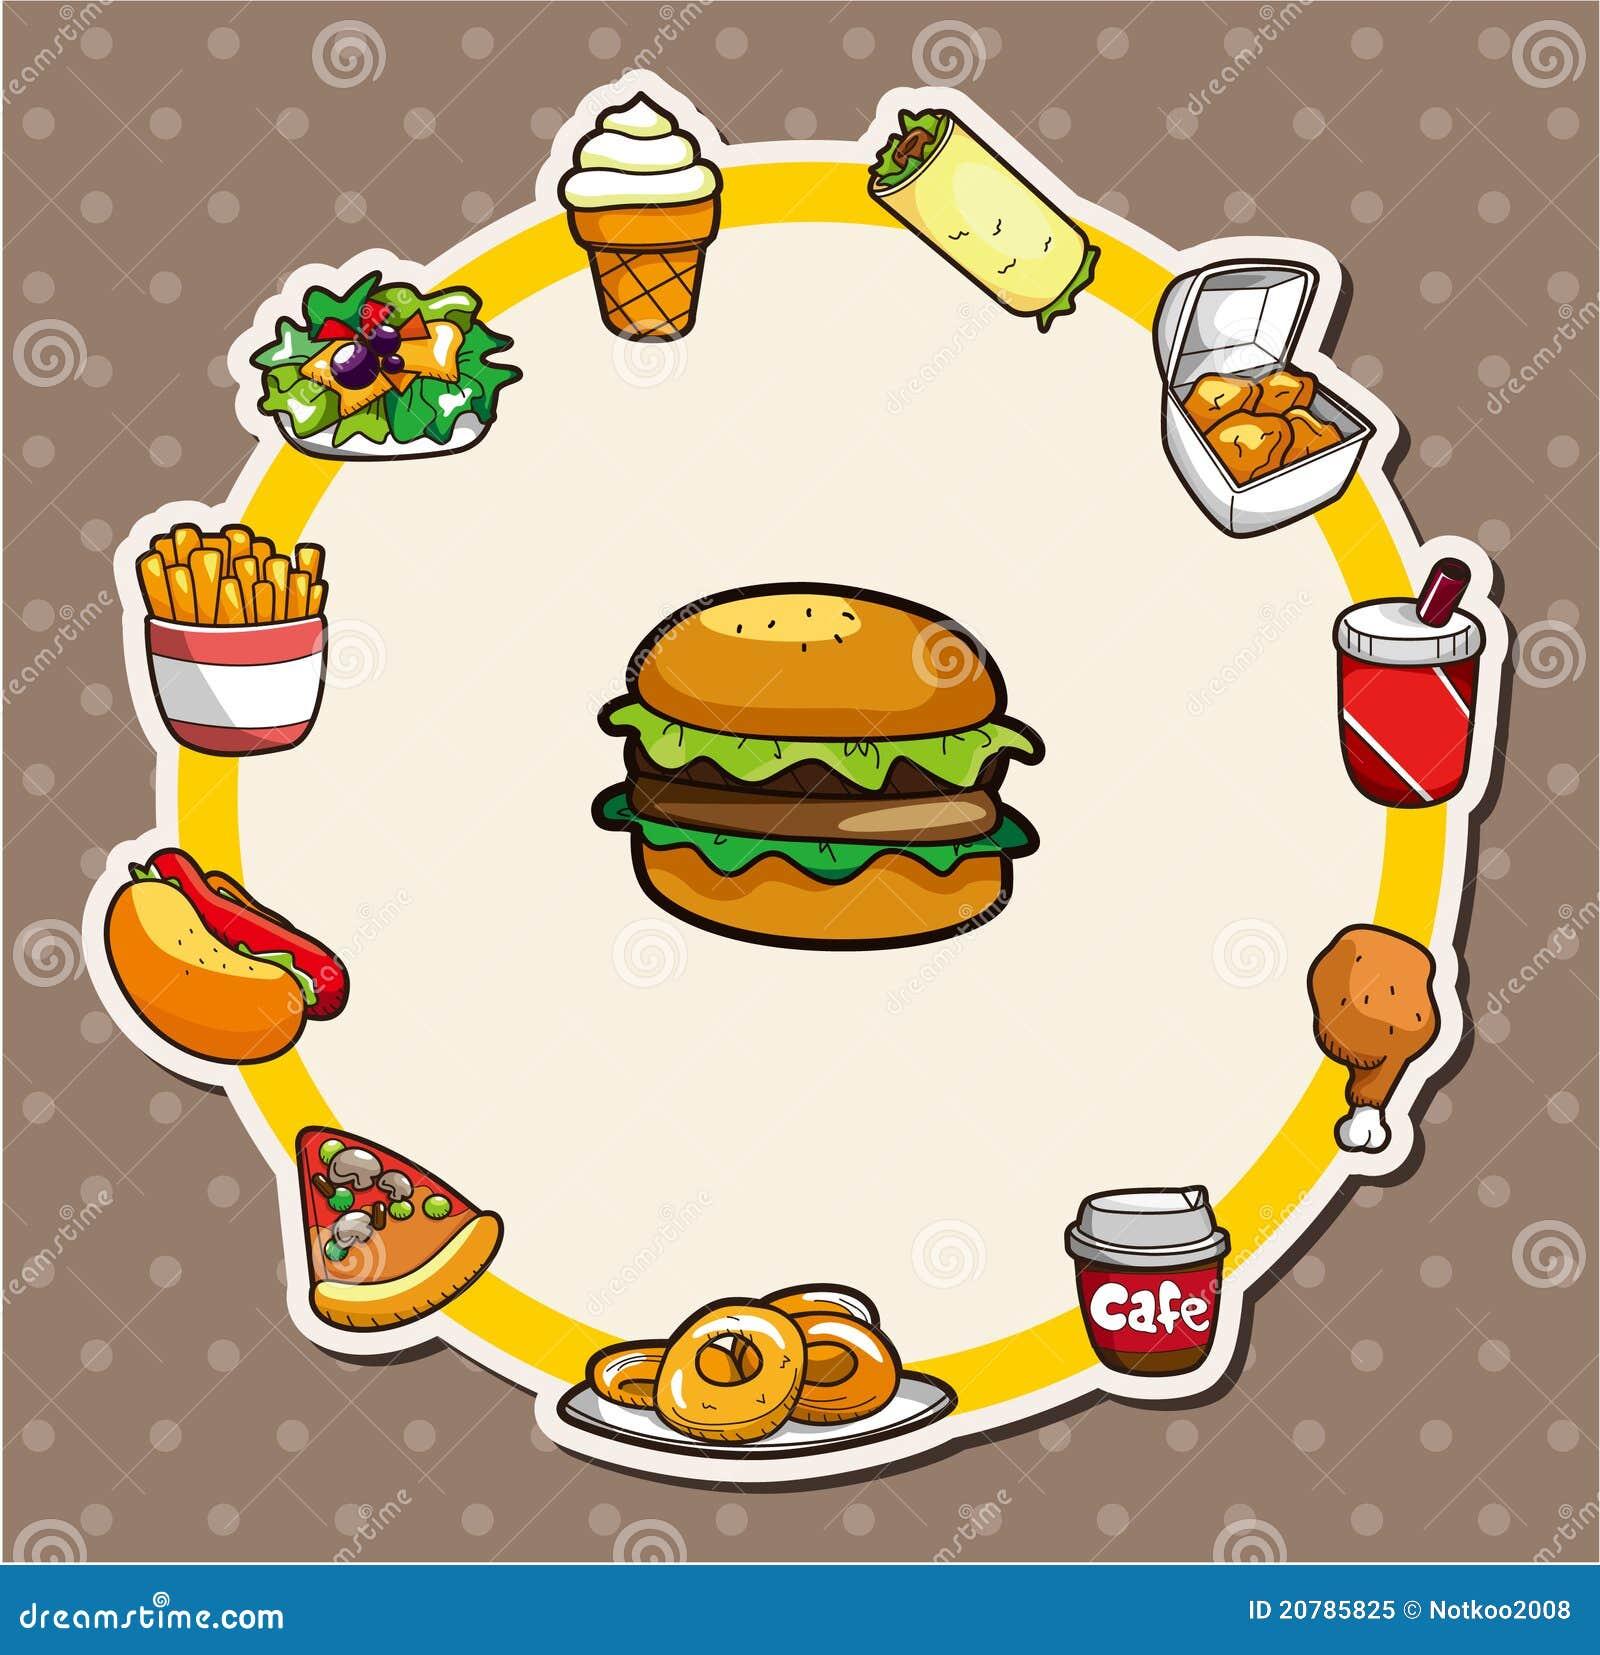 Cartoon Fast-food Card Royalty Free Stock Photo